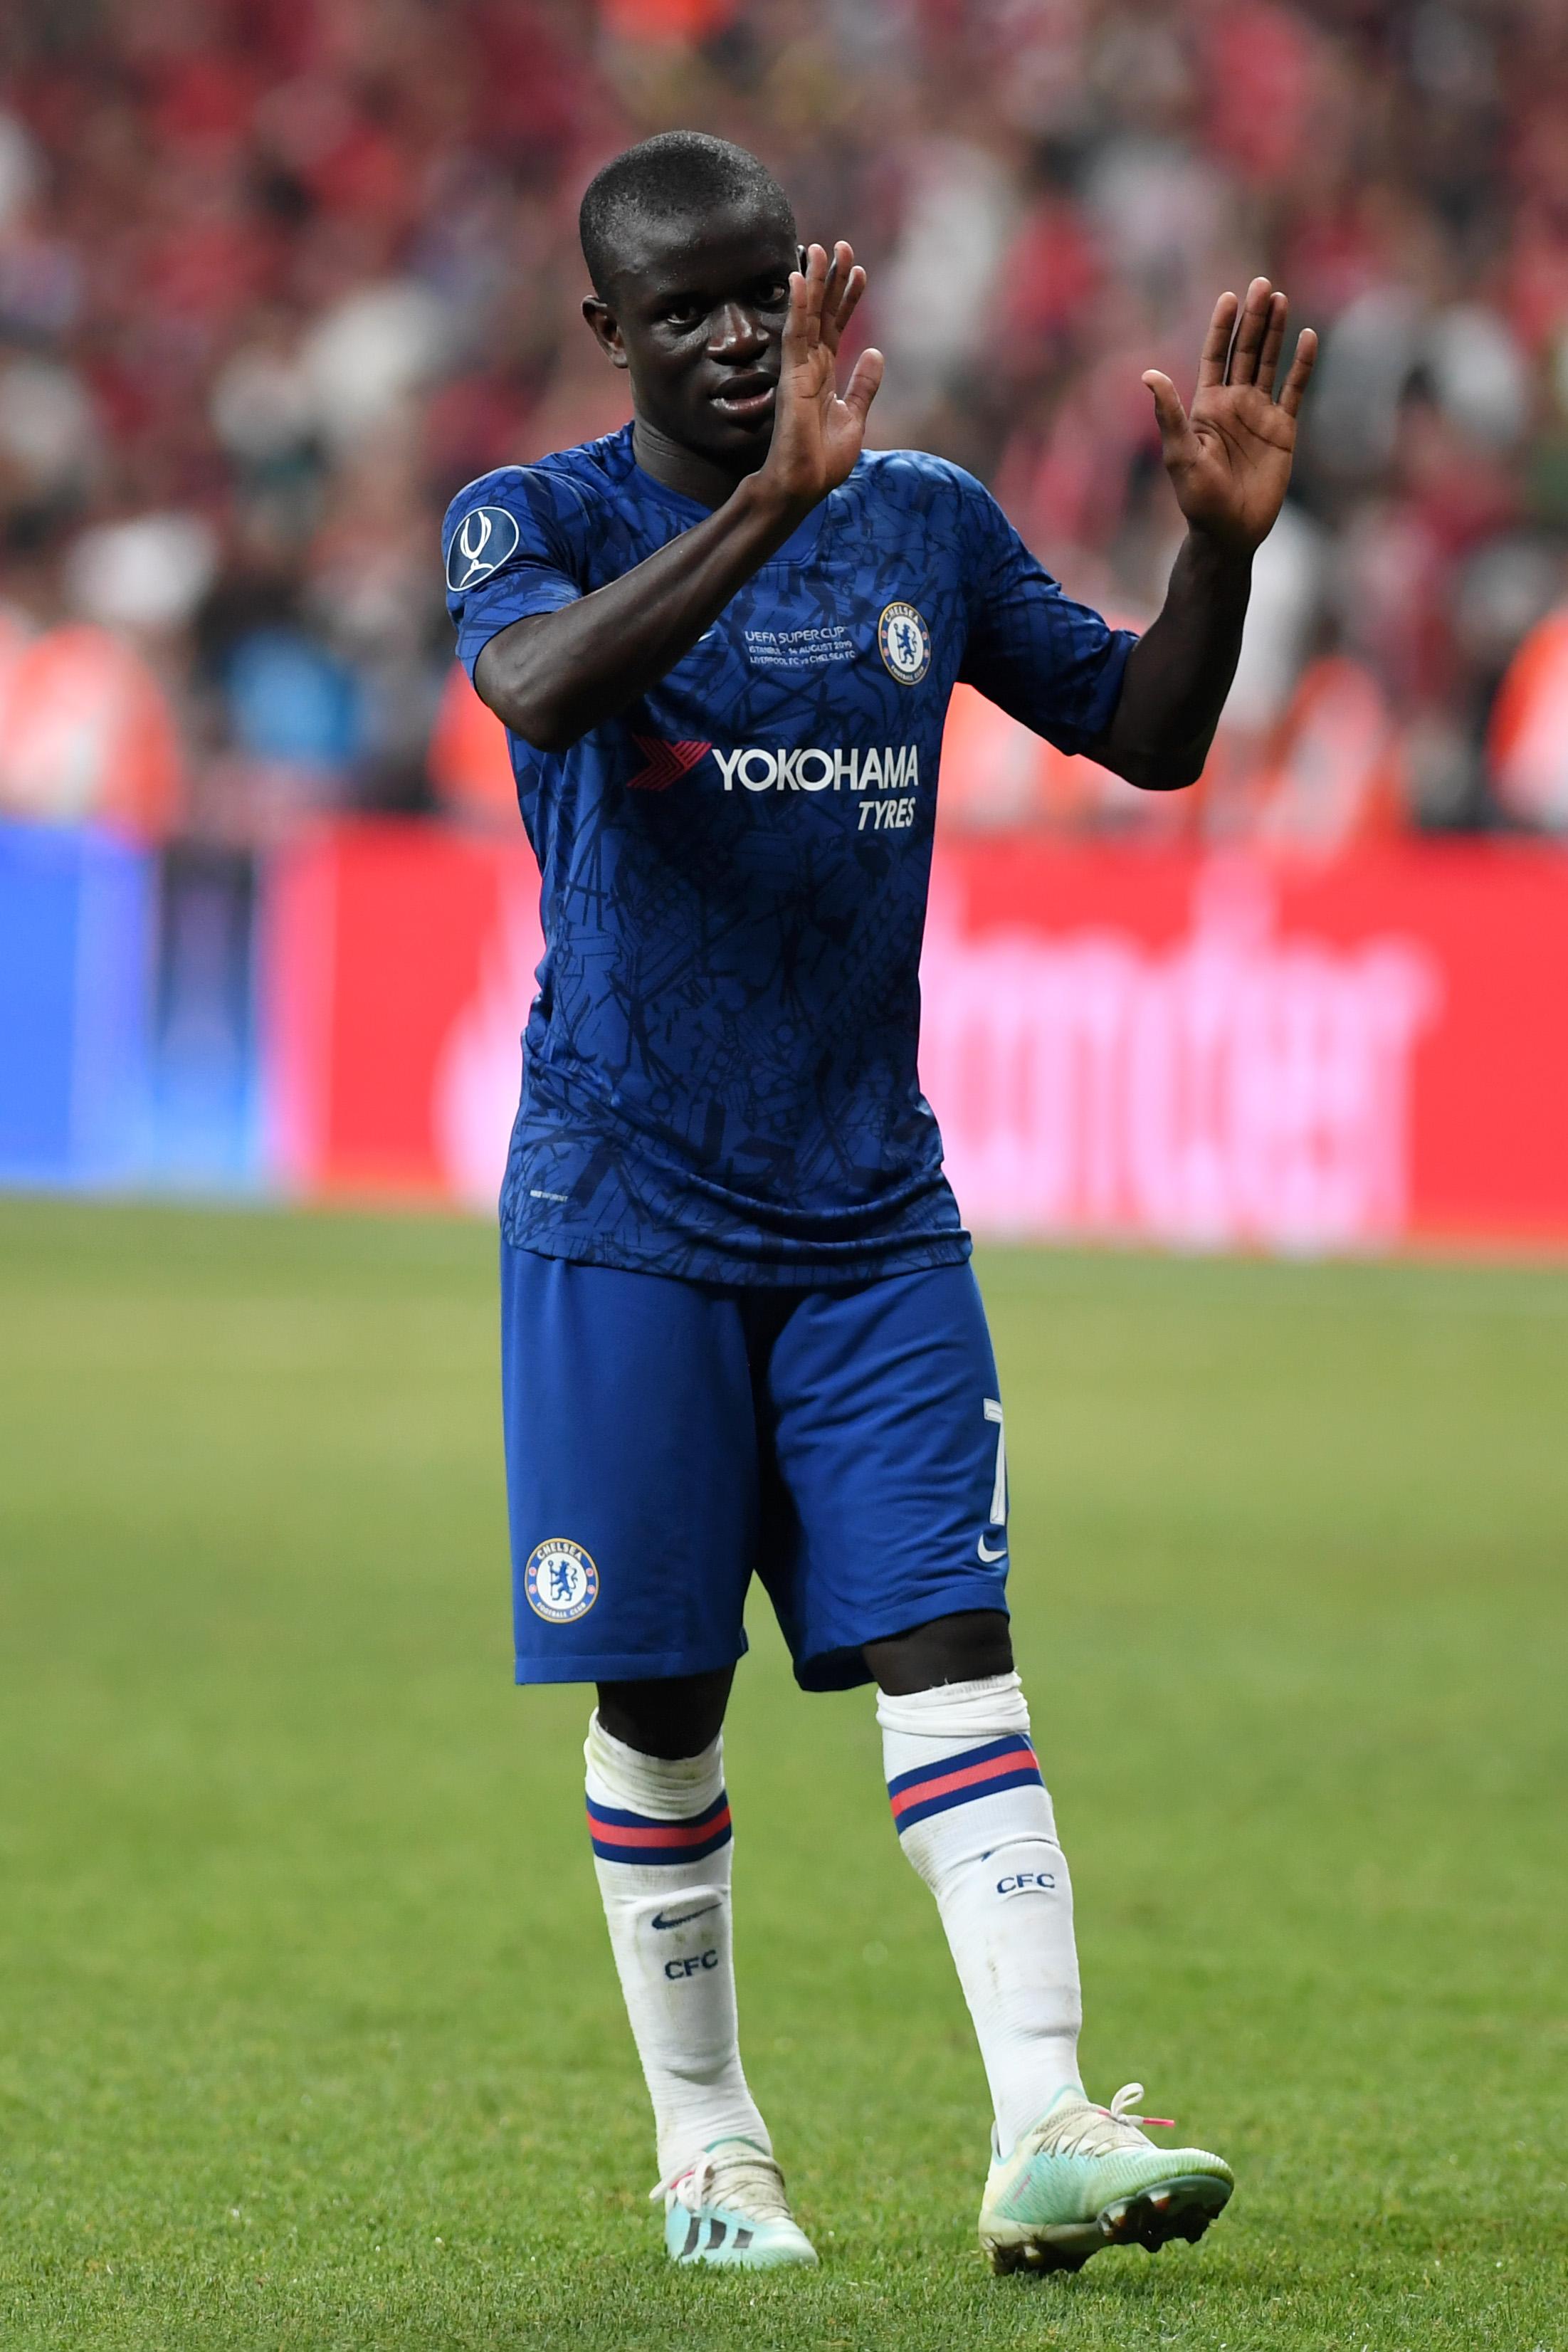 Liverpool 2-2 (5-4 p/k) Chelsea, Player Ratings: Let's talk about Kanté, baby!